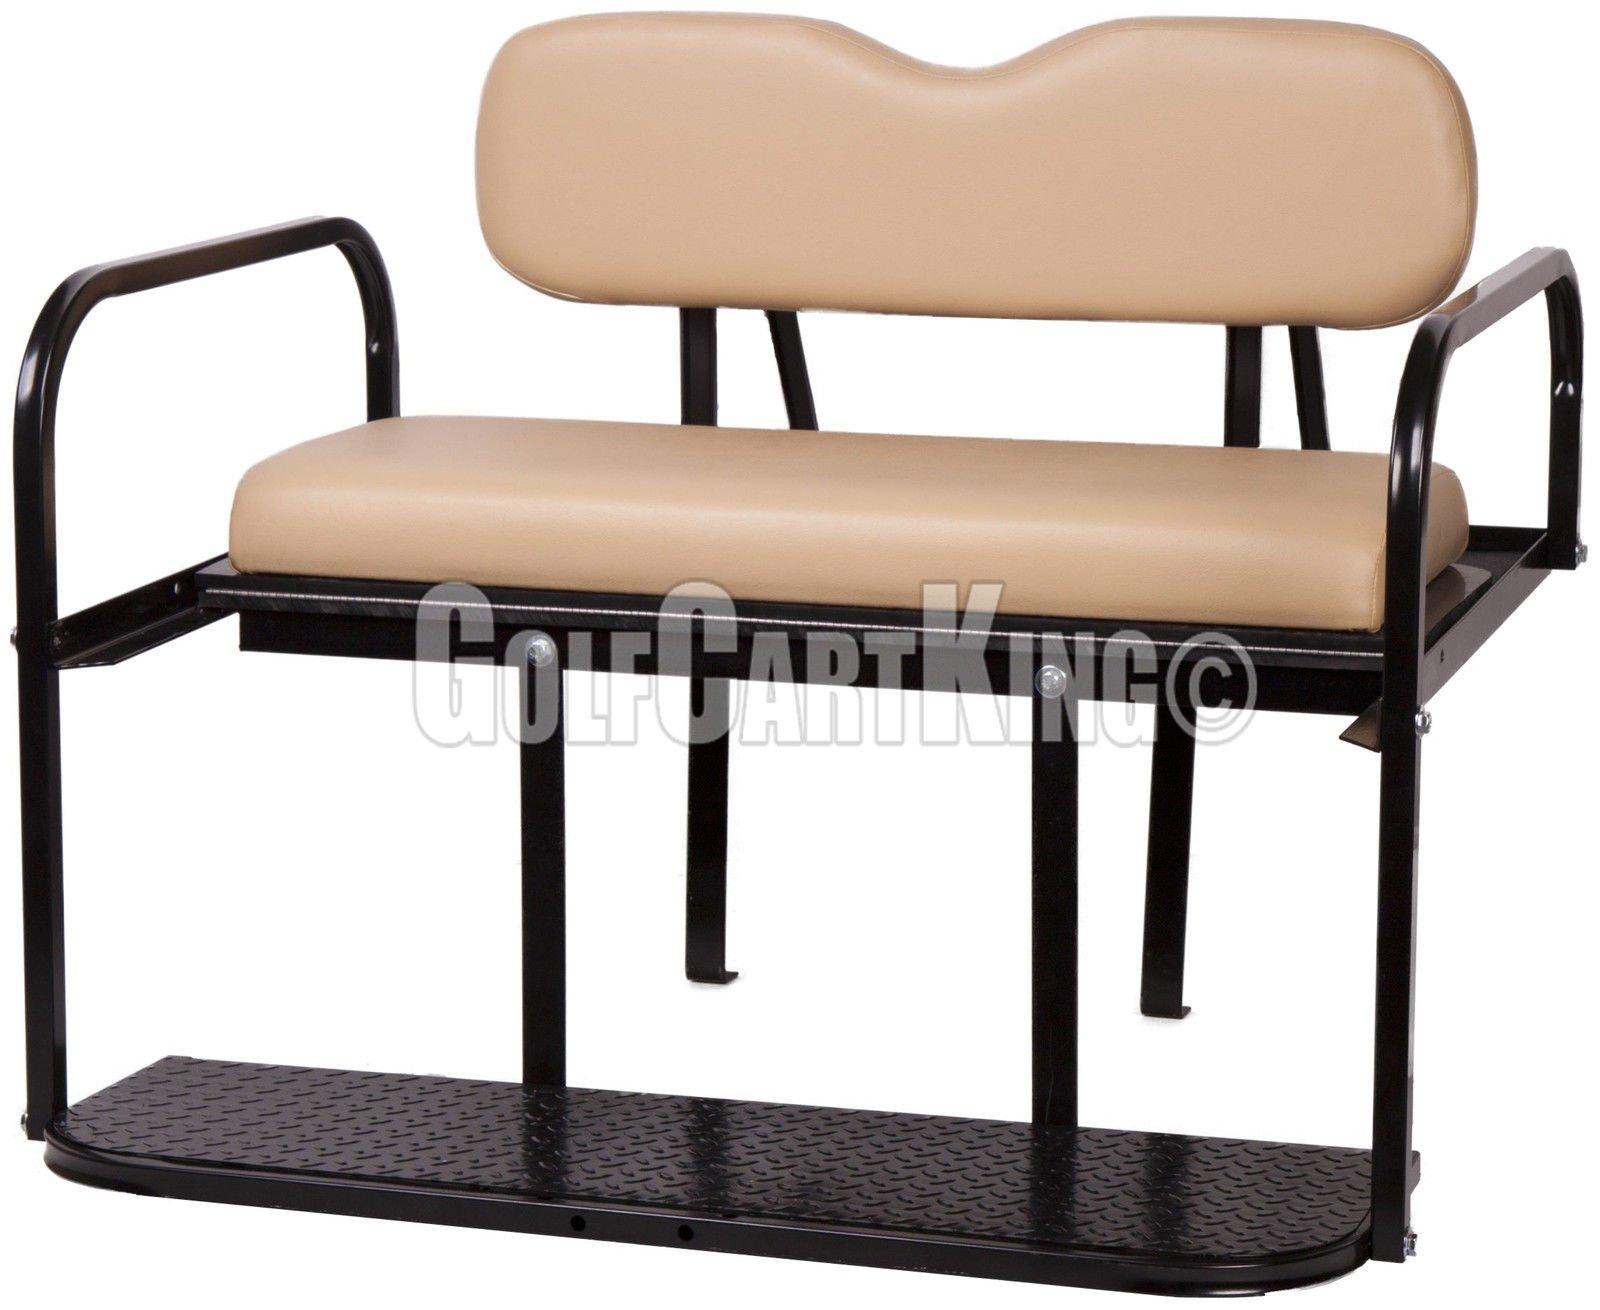 EZGO TXT (1995 - Up) Golf Cart Rear Flip Seat Kit - Tan